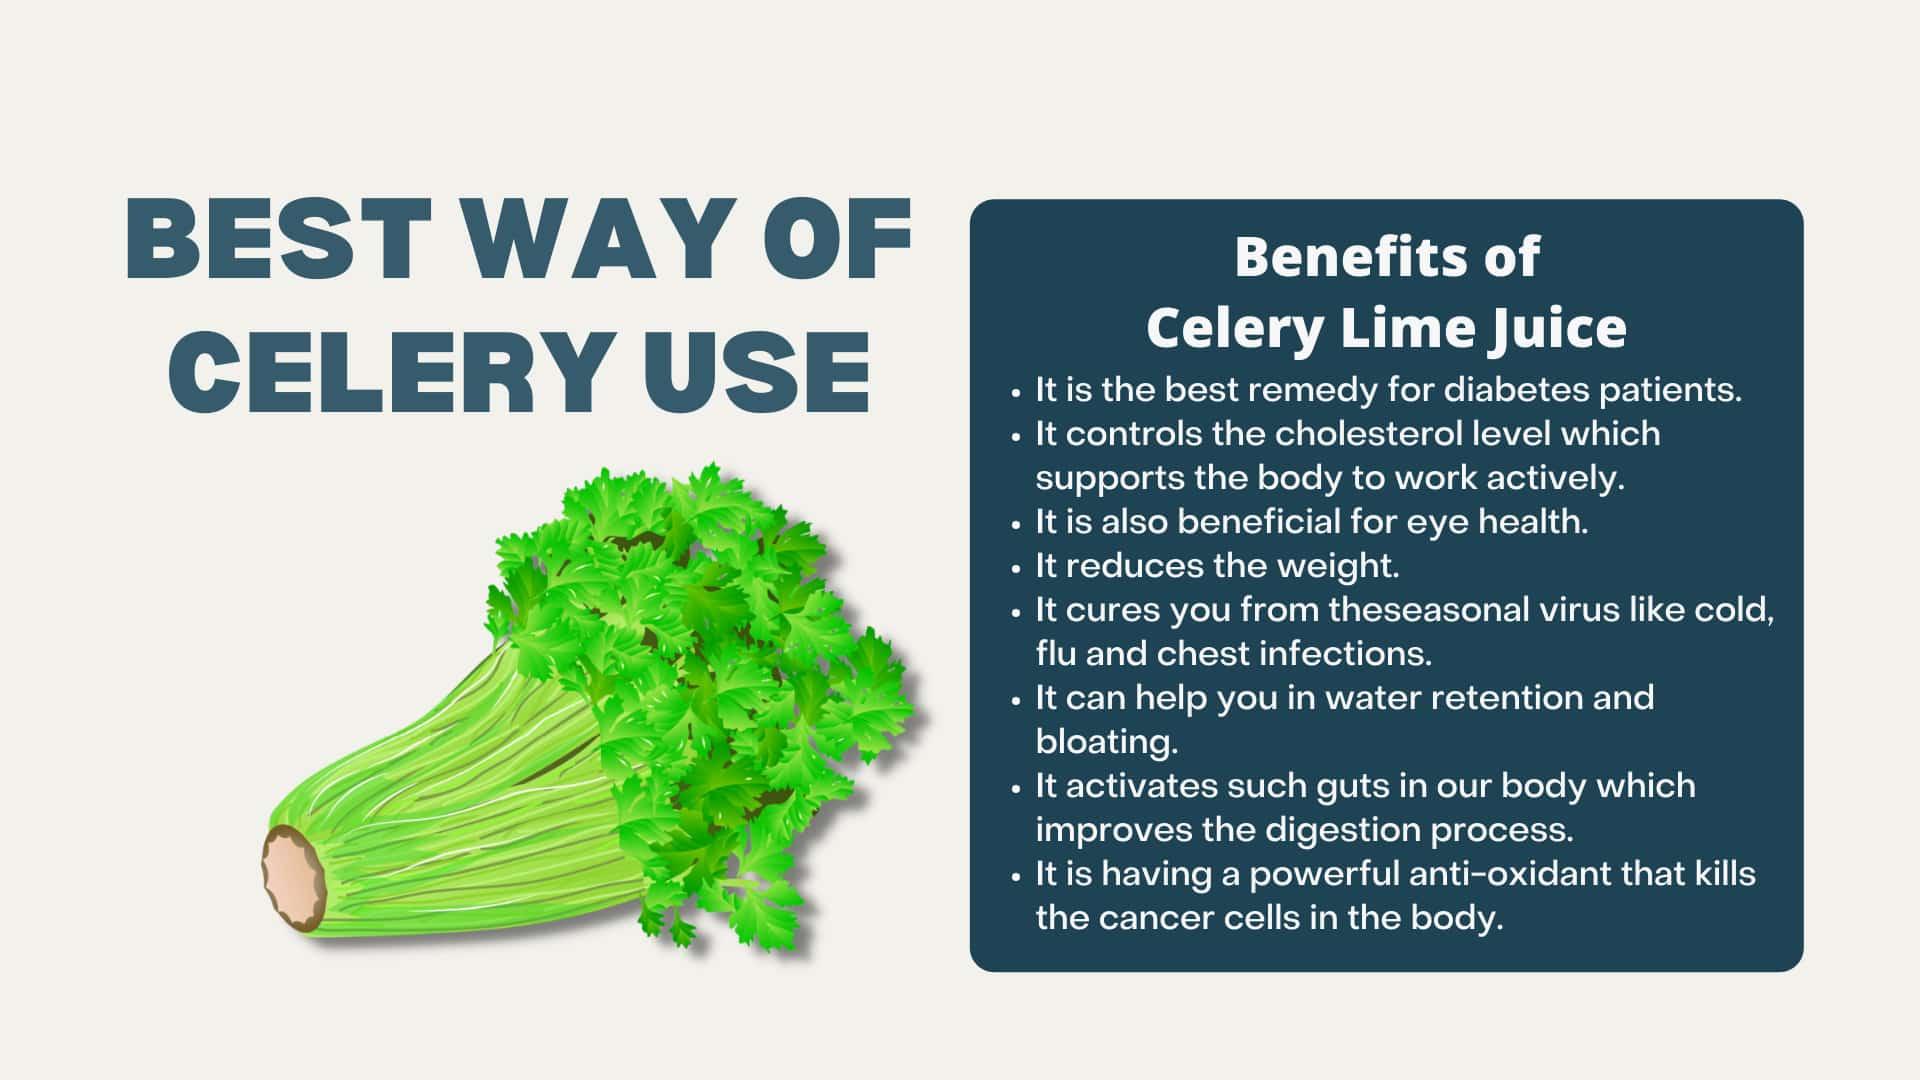 Best Way of Celery Use